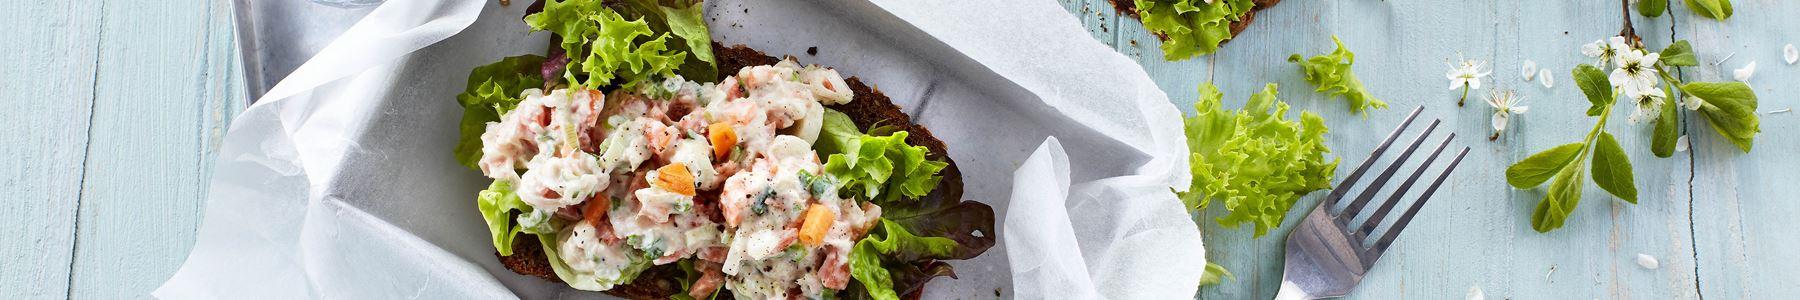 Hurtig + Gulerod + Salater + Familiens favoritter